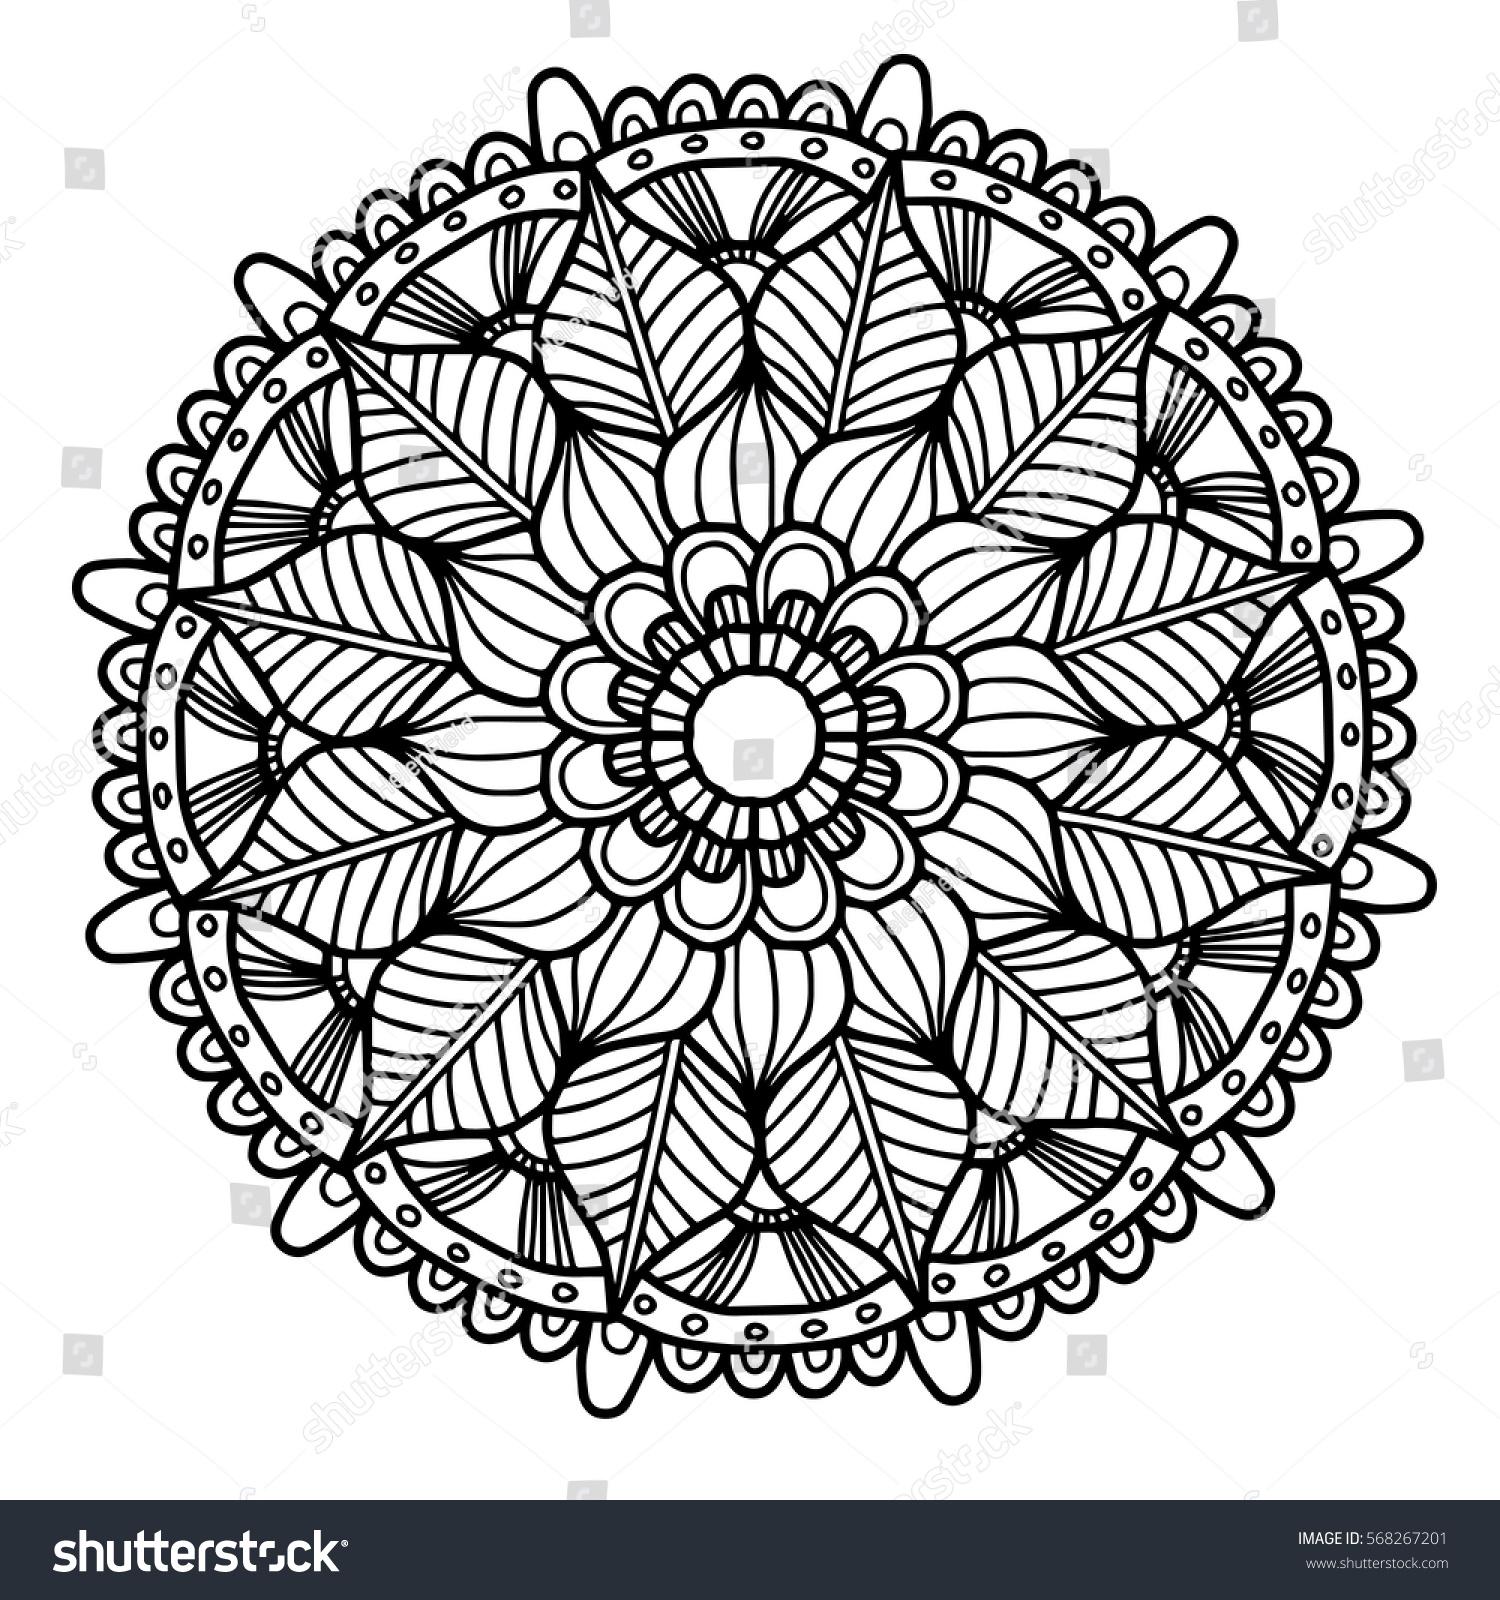 Vector Image Adult Coloring Book Mandala Stock Vector (Royalty Free ...